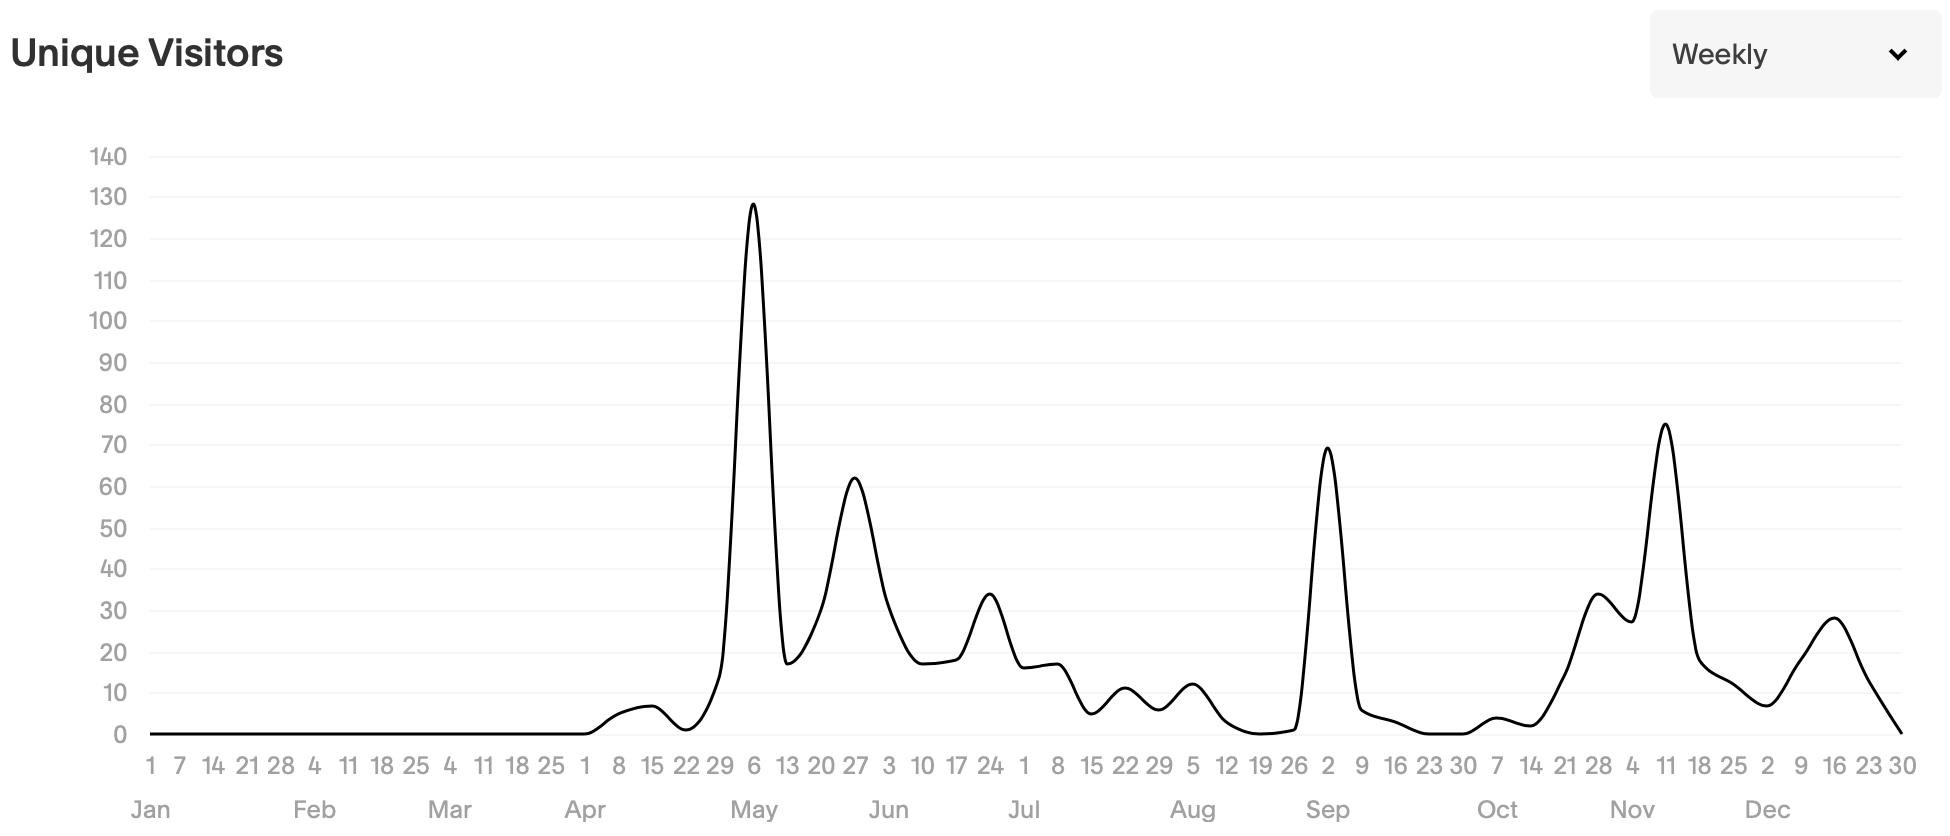 traffic_analytics_uniquevisitors02.png